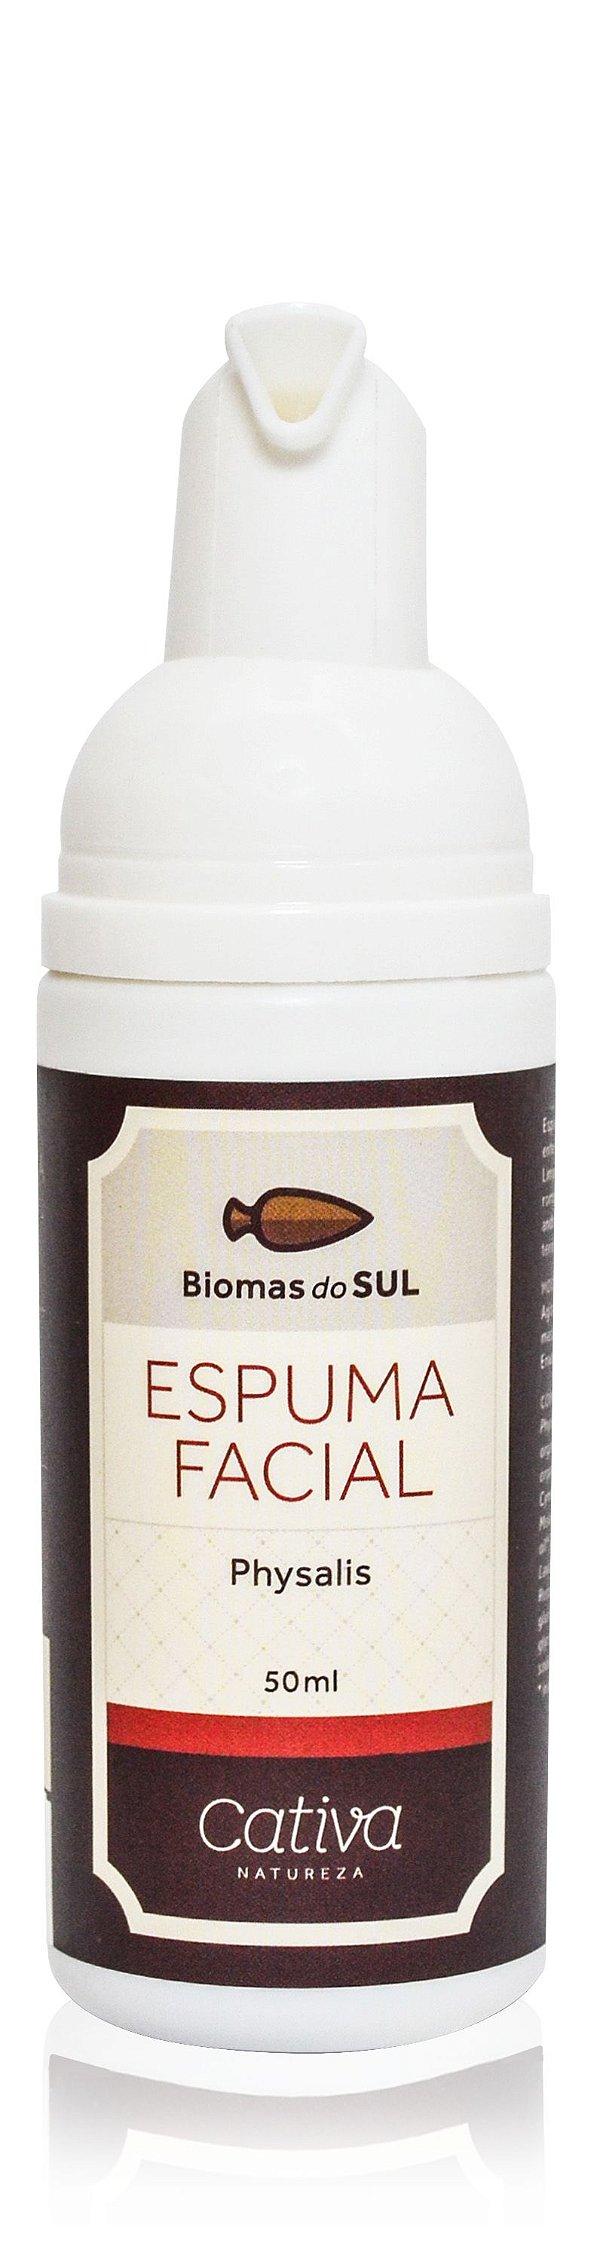 Espuma Facial Biomas Physalis 50ml